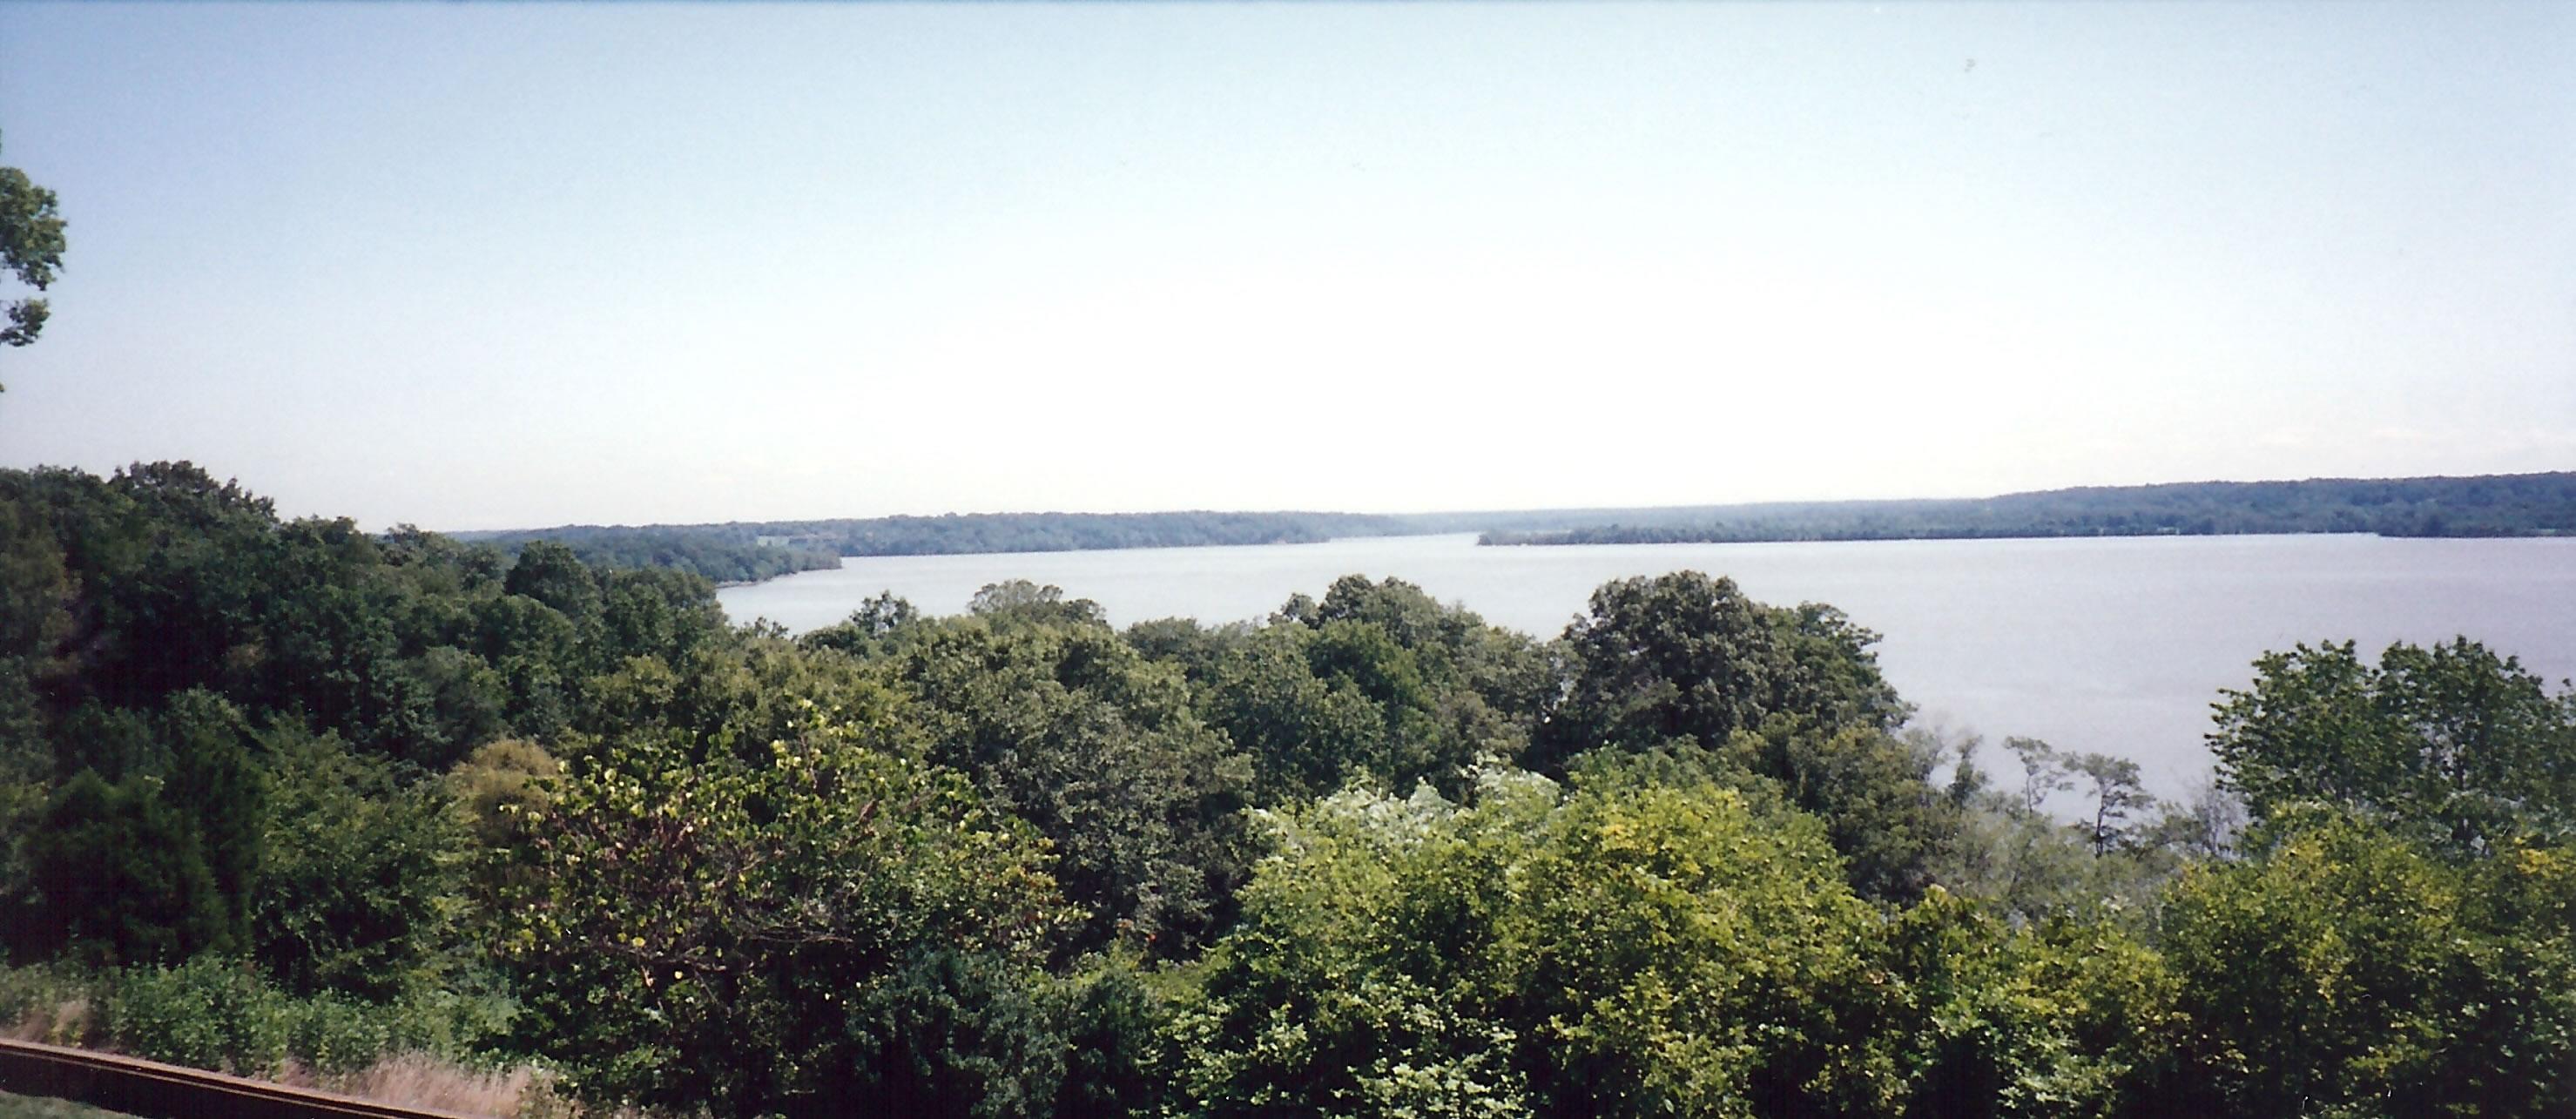 Depiction of Potomac